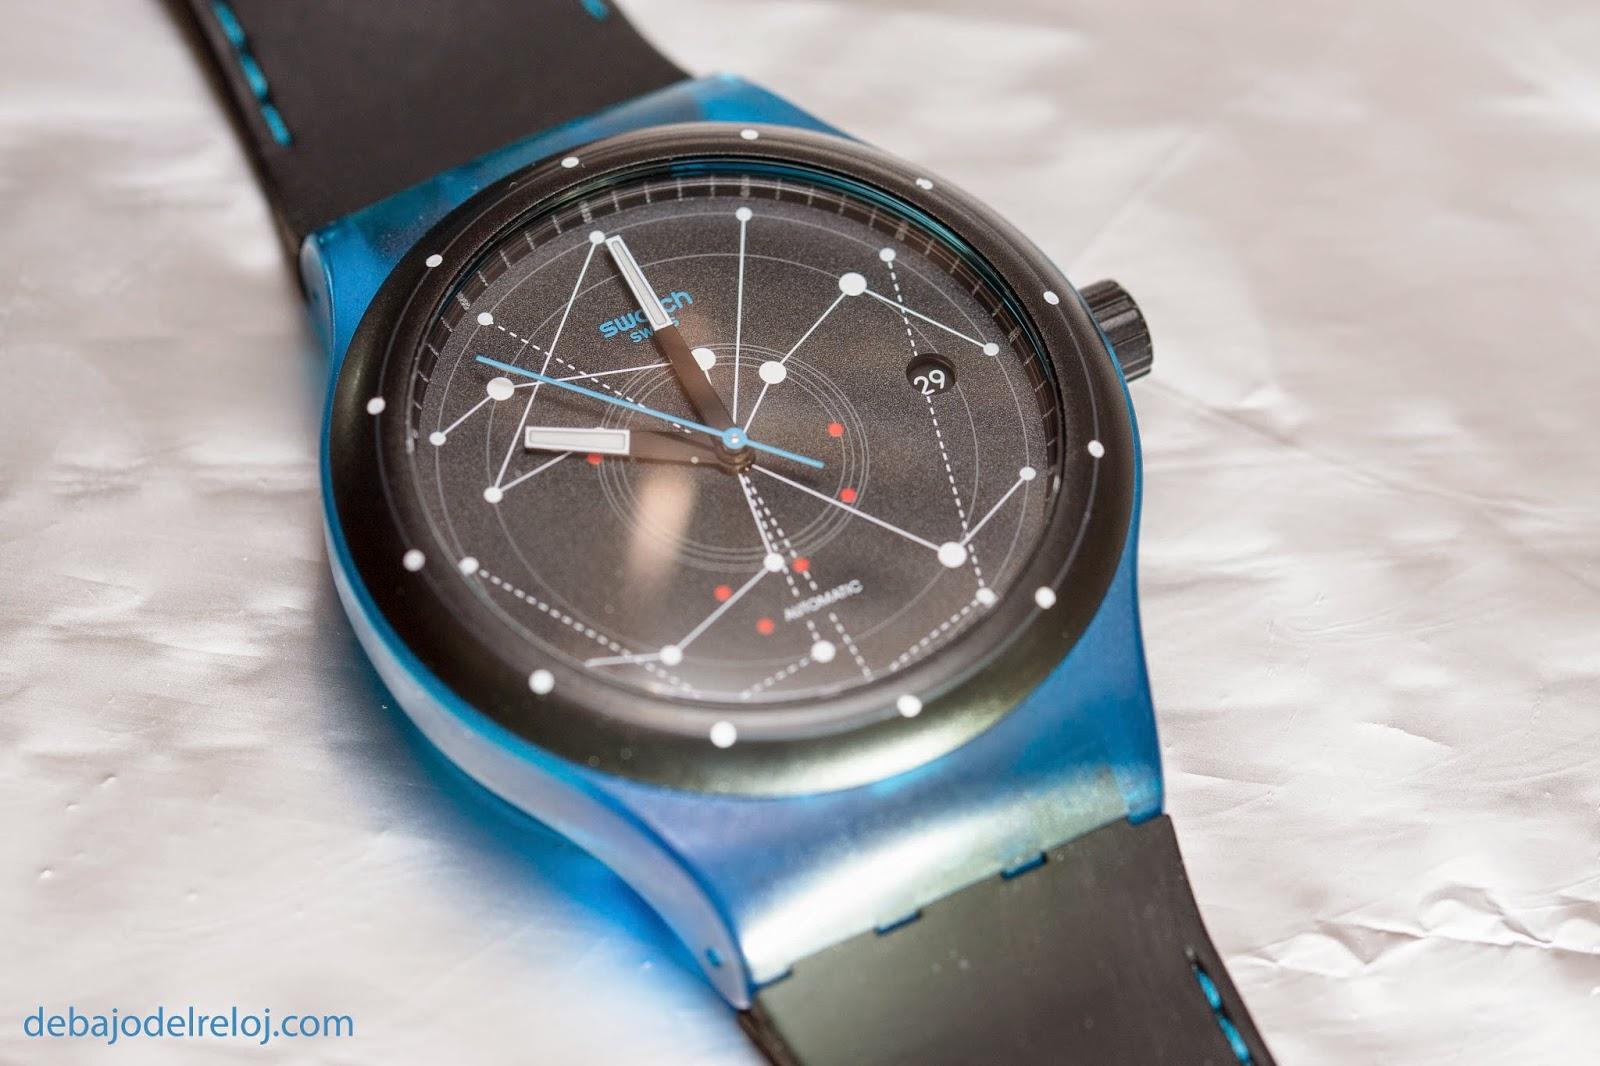 Uno de mis relojes: Swatch Sistem51 debajodelreloj3